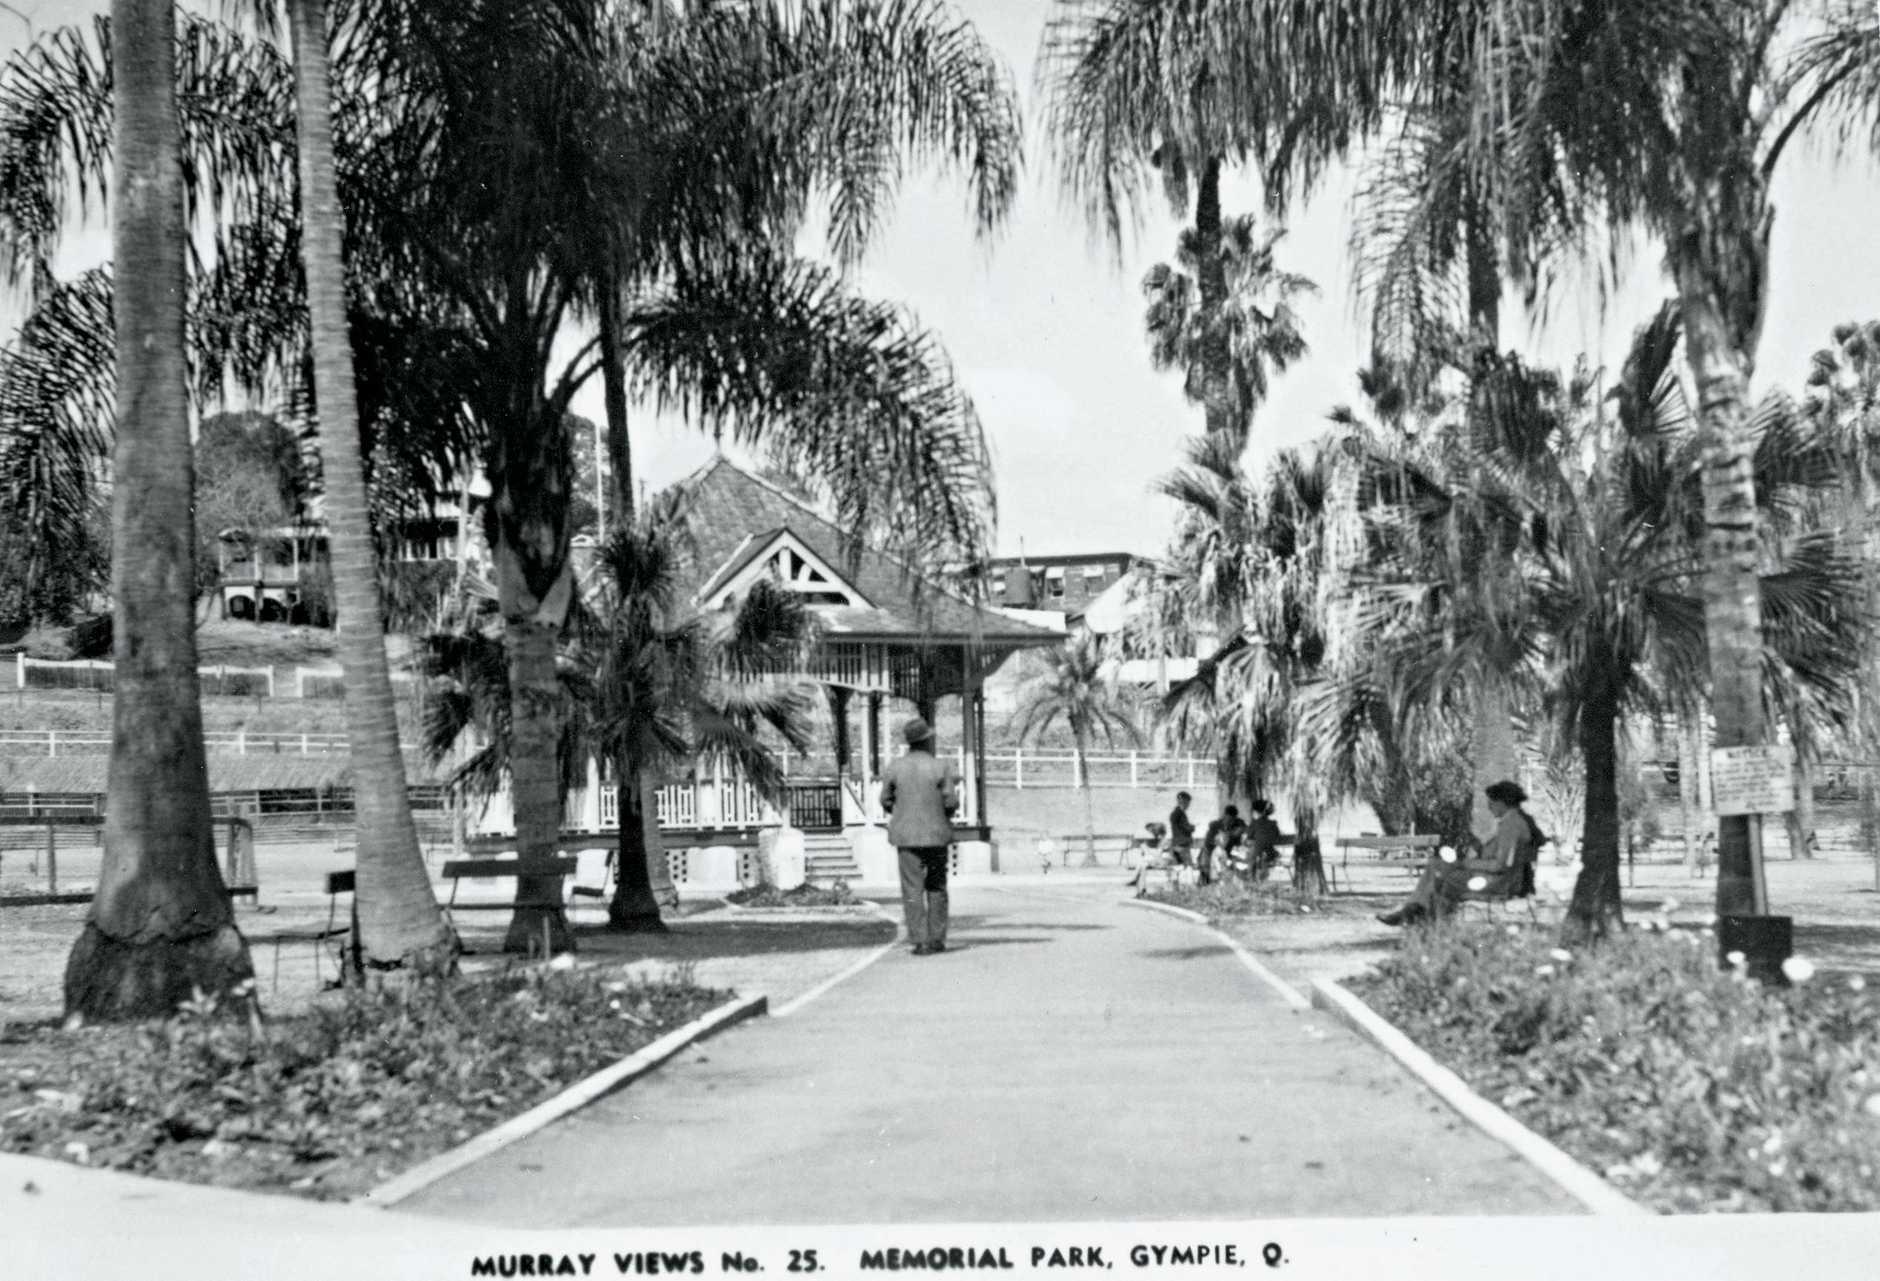 Memorial Park, Gympie Murray Views Postcard.Attribution: Gympie Regional Libraries